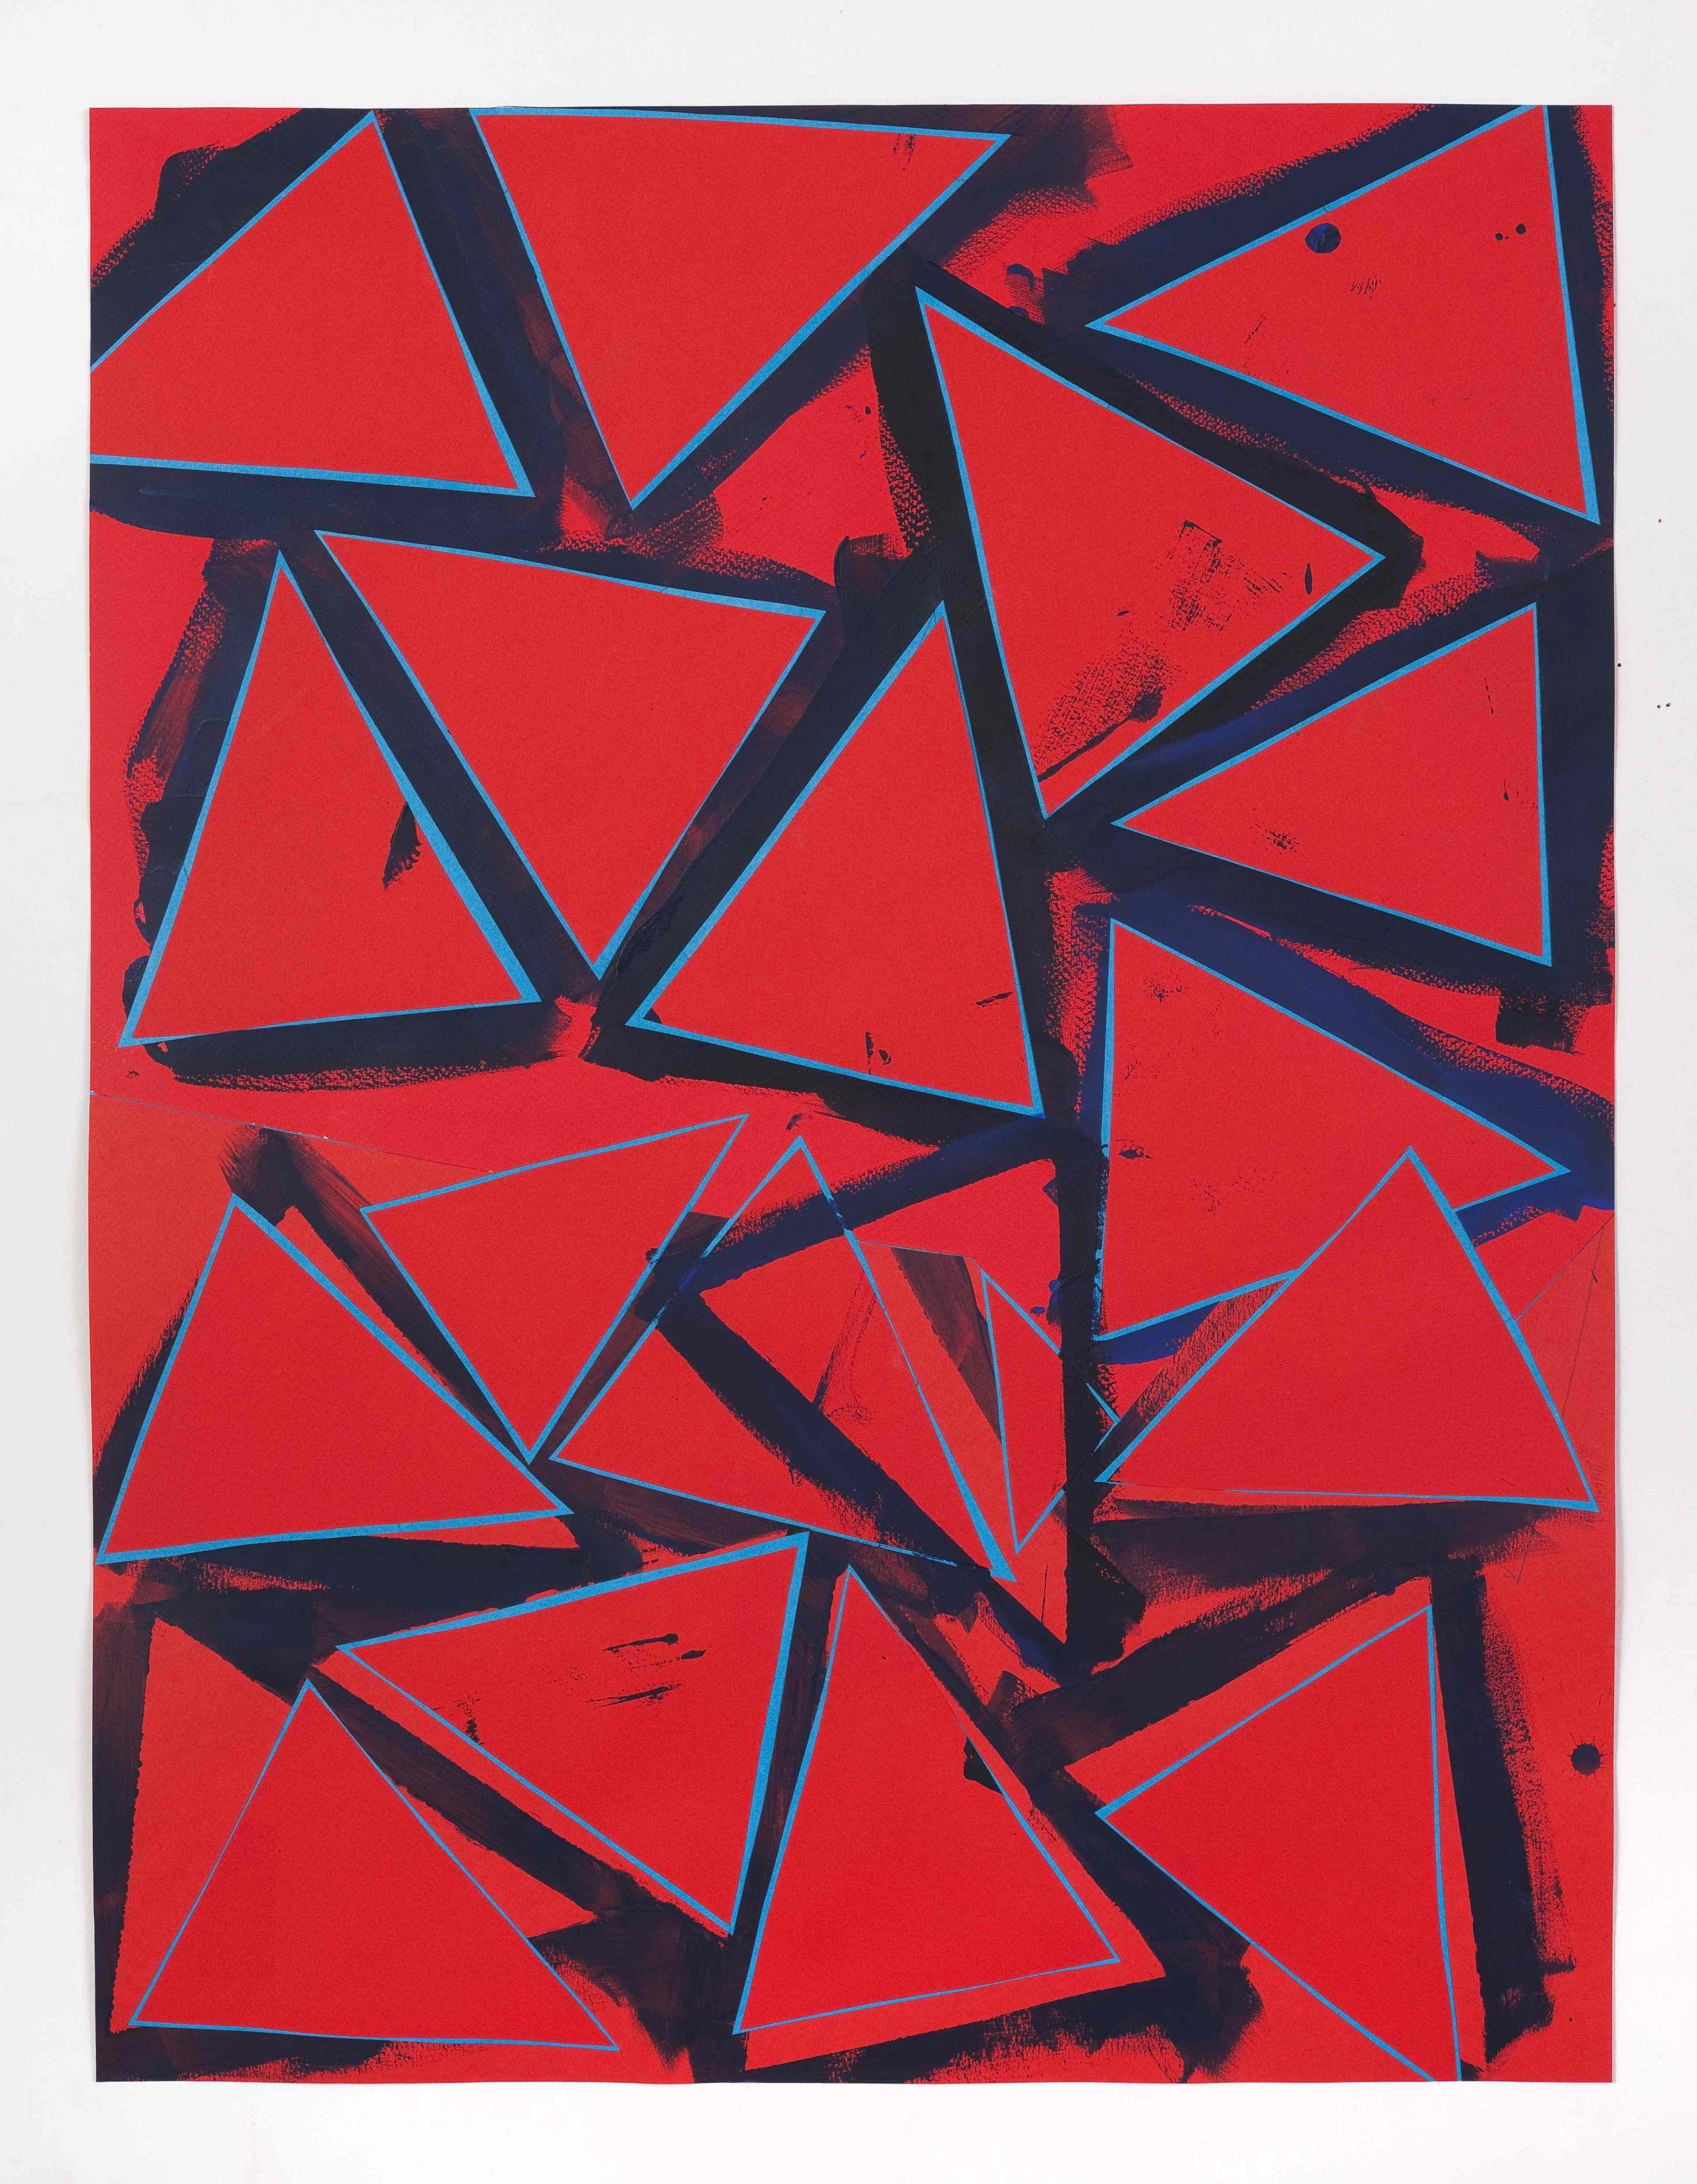 Lecia Dole-Recio, Untitled (rd.ppr.bl.trngls.bl.Ins.), 2013